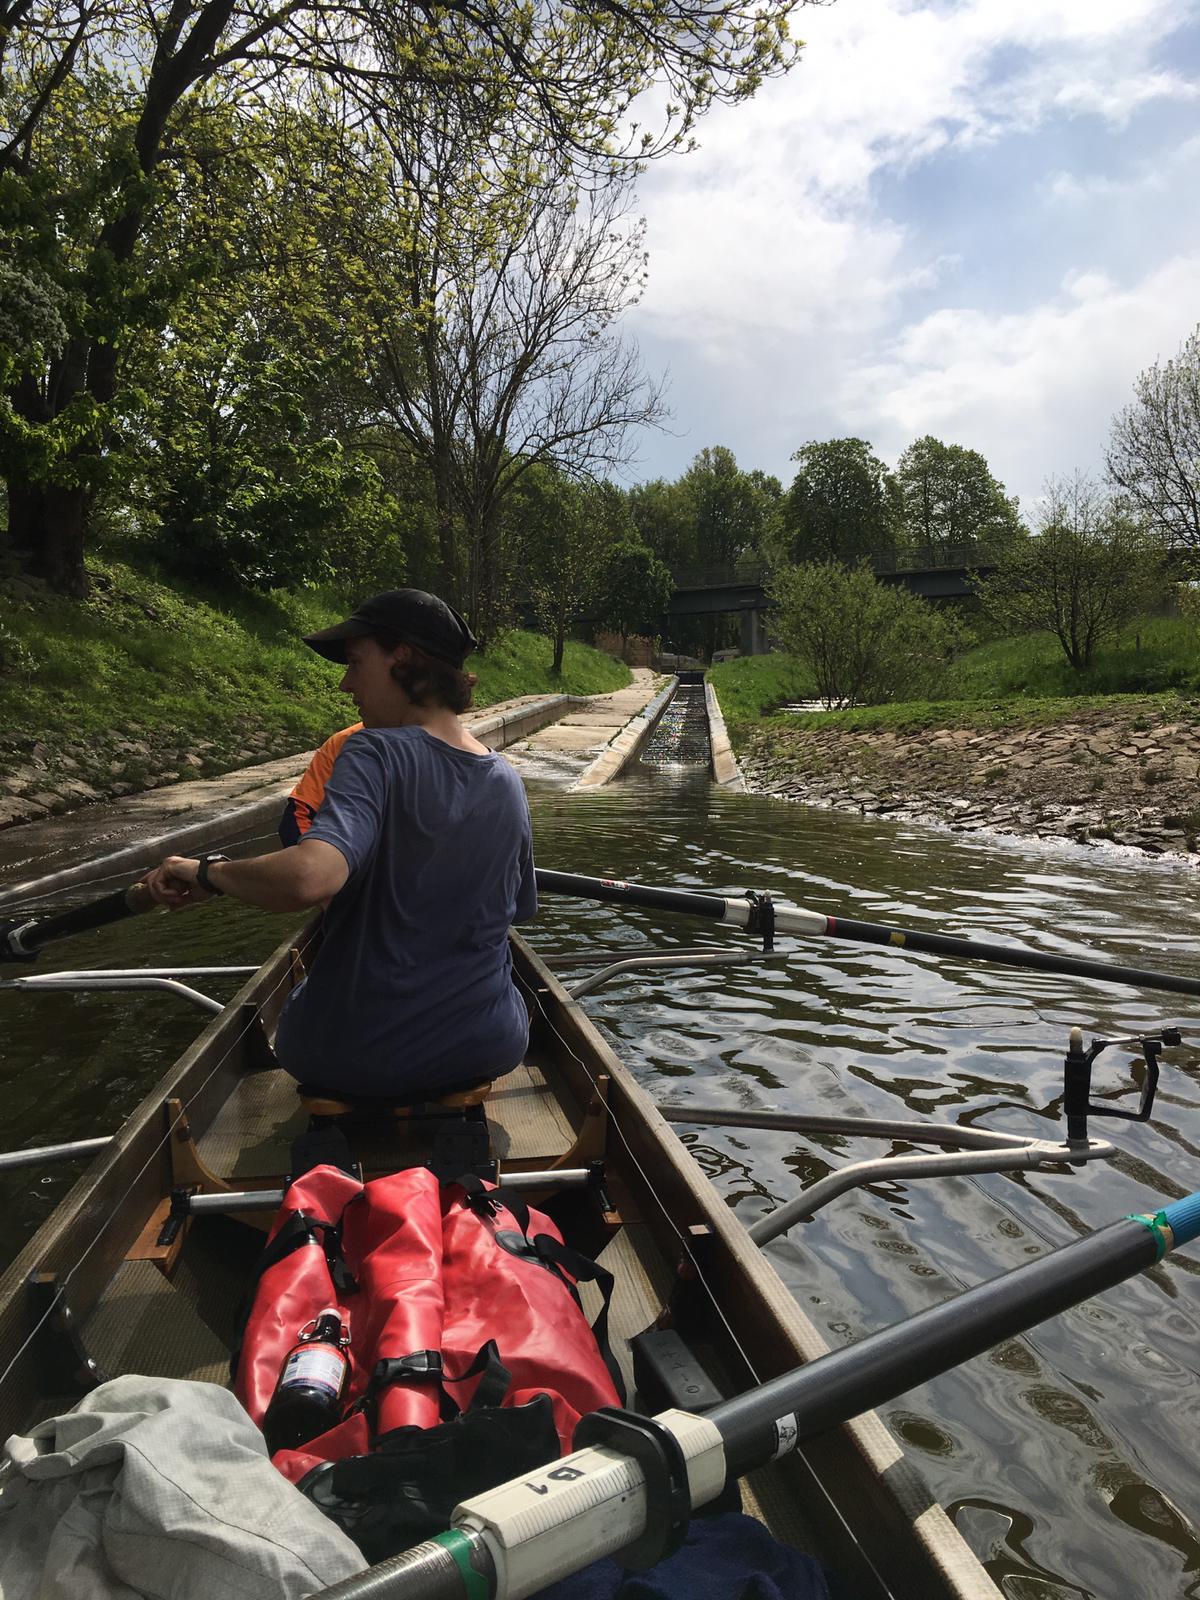 maiwanderfahrt-weser-2019-2_0002_2019-04-30_07-16-54.jpg